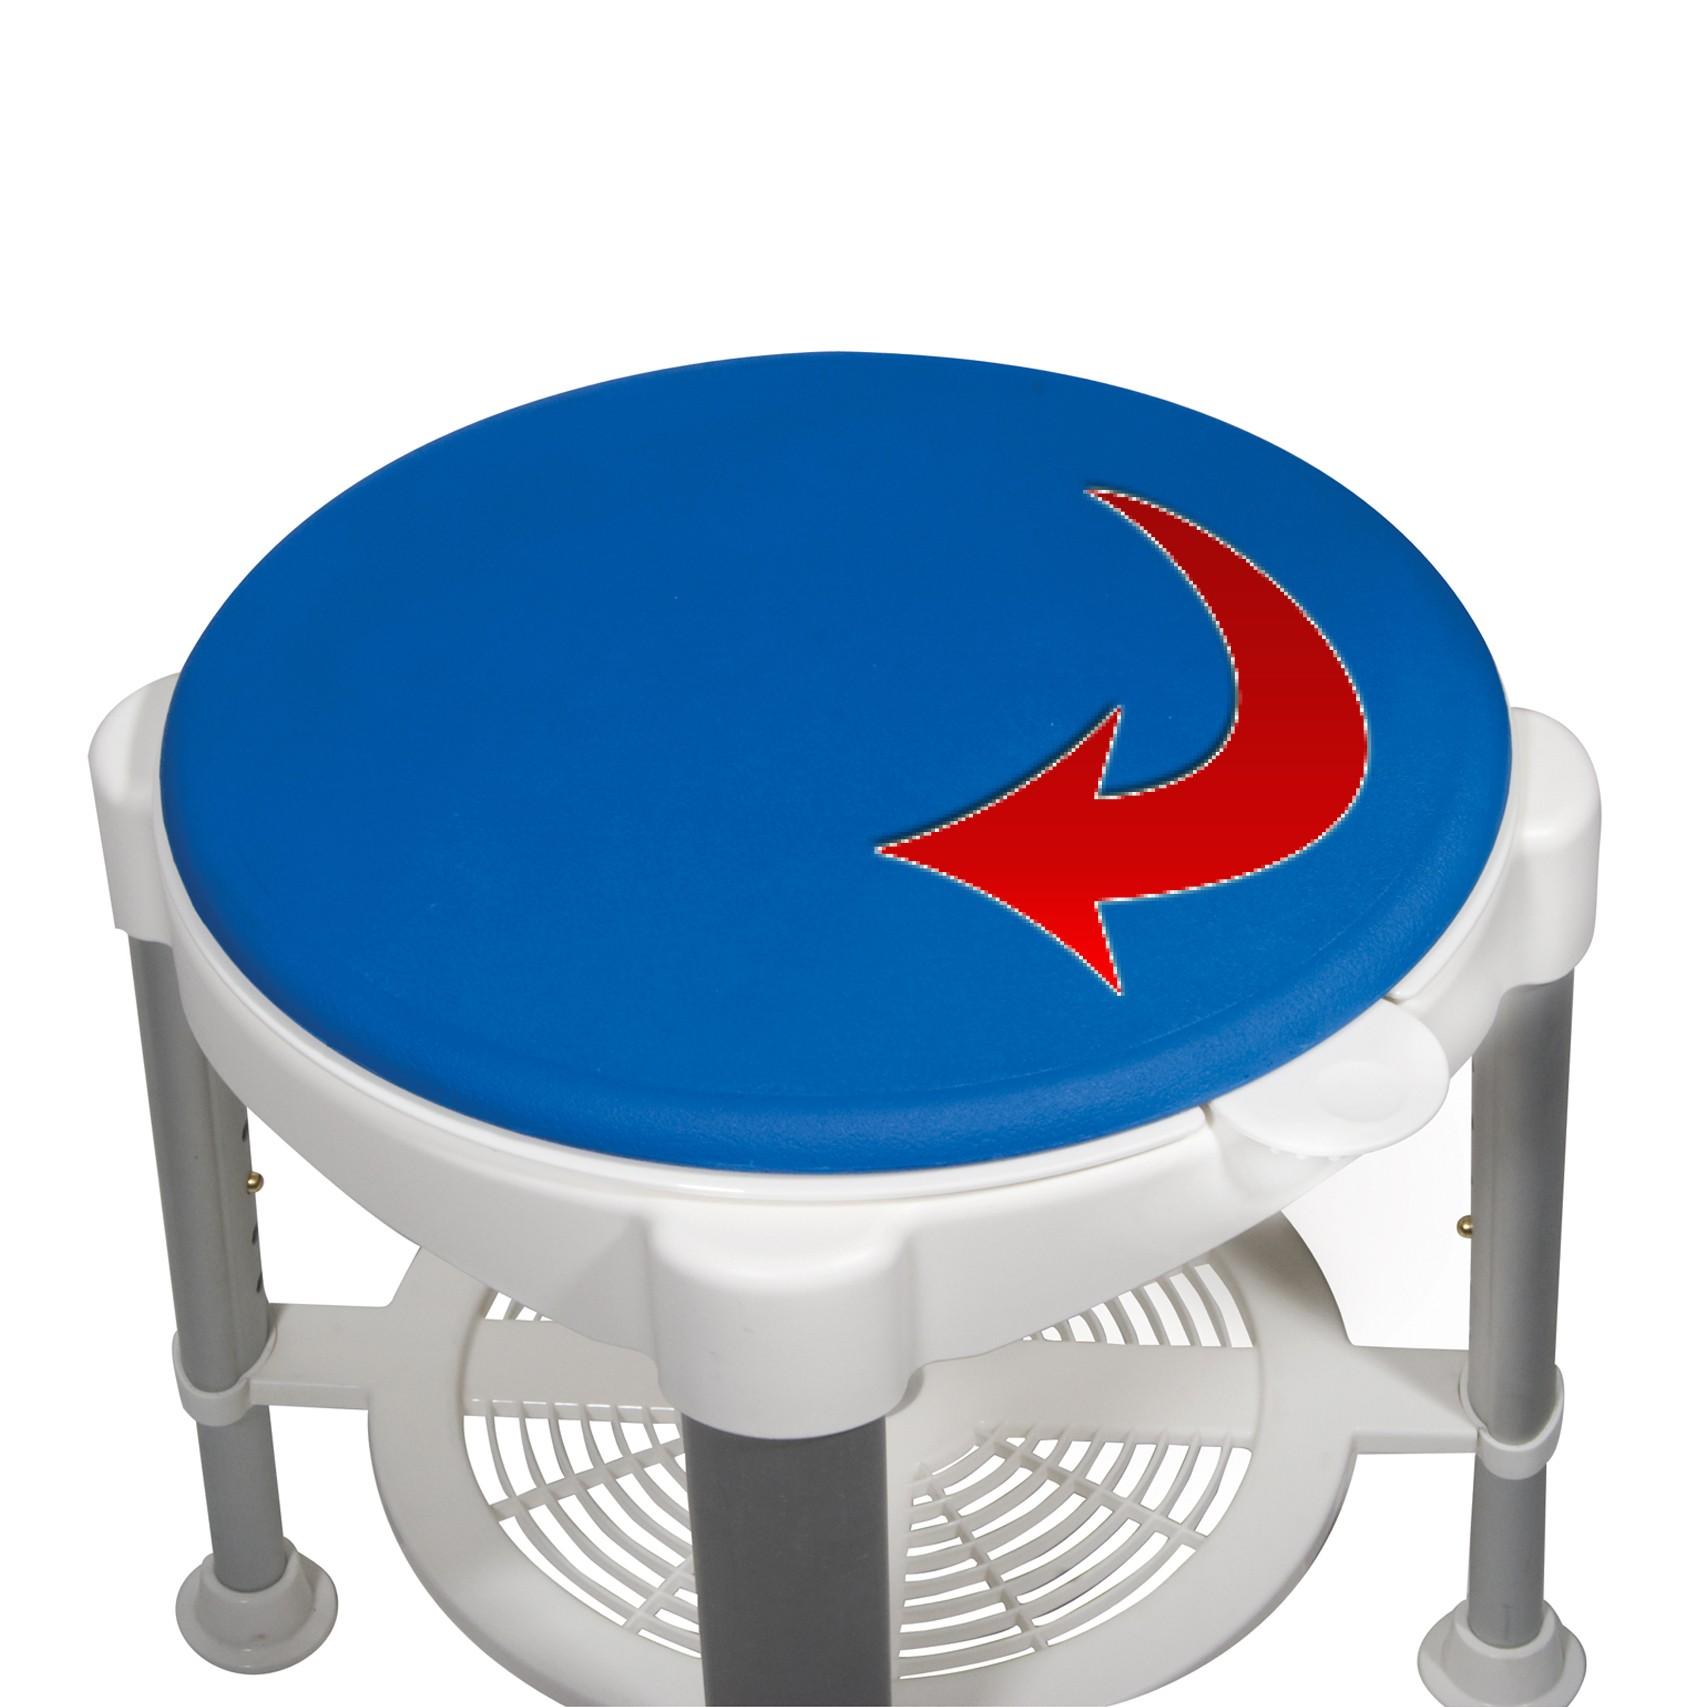 bath_stool_with_padded_rotating_seat1.jpg